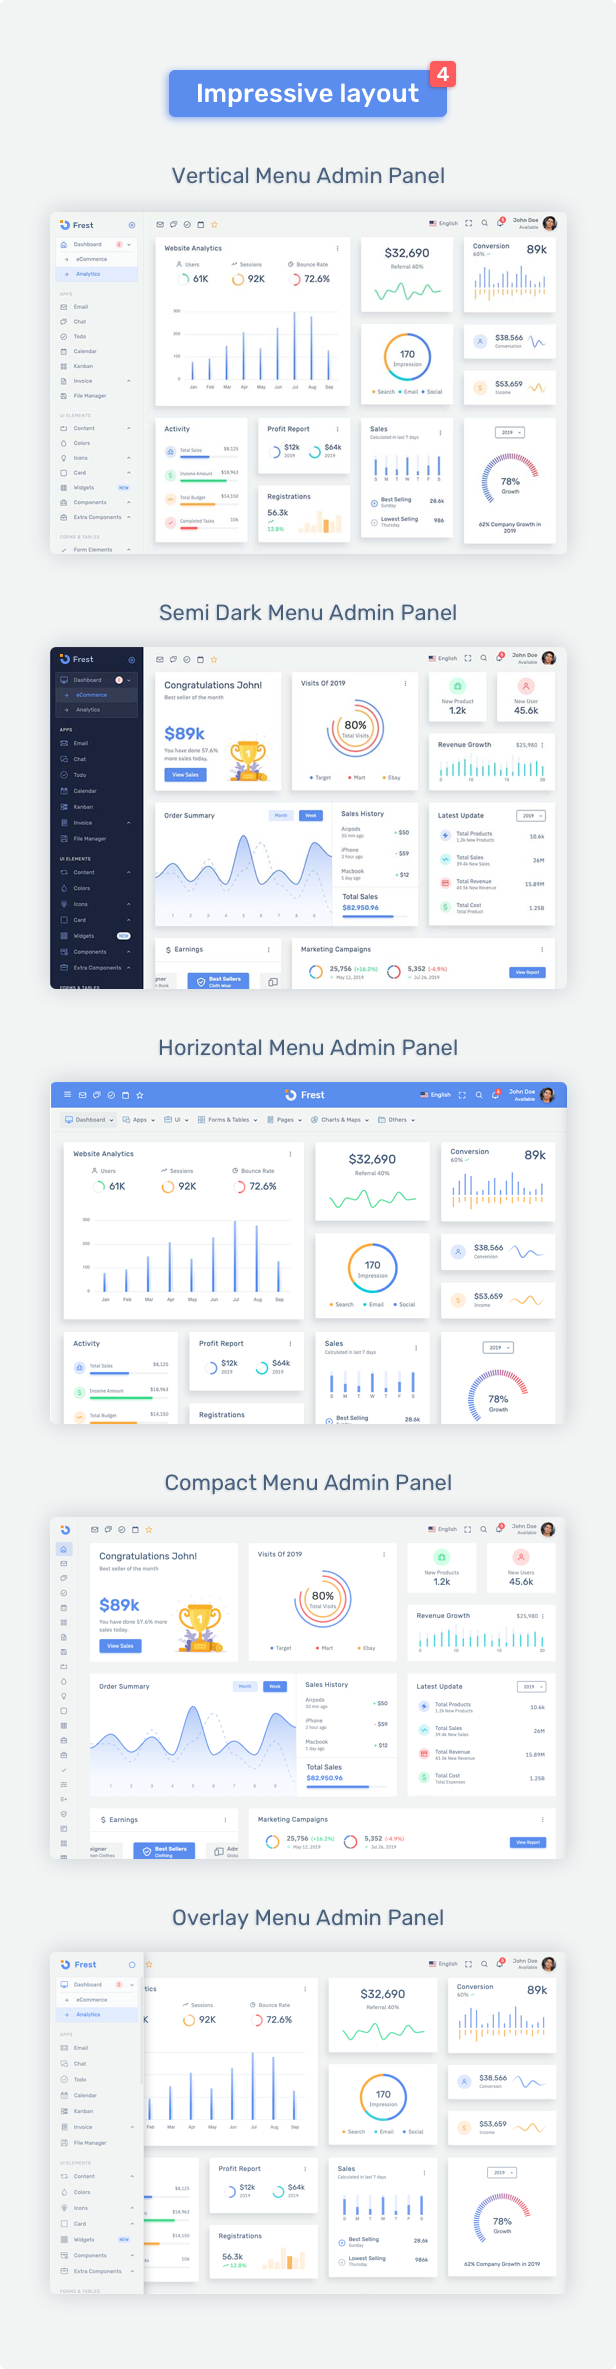 dkFi3VC - Frest – Admin Dashboard UI Kit Sketch Template